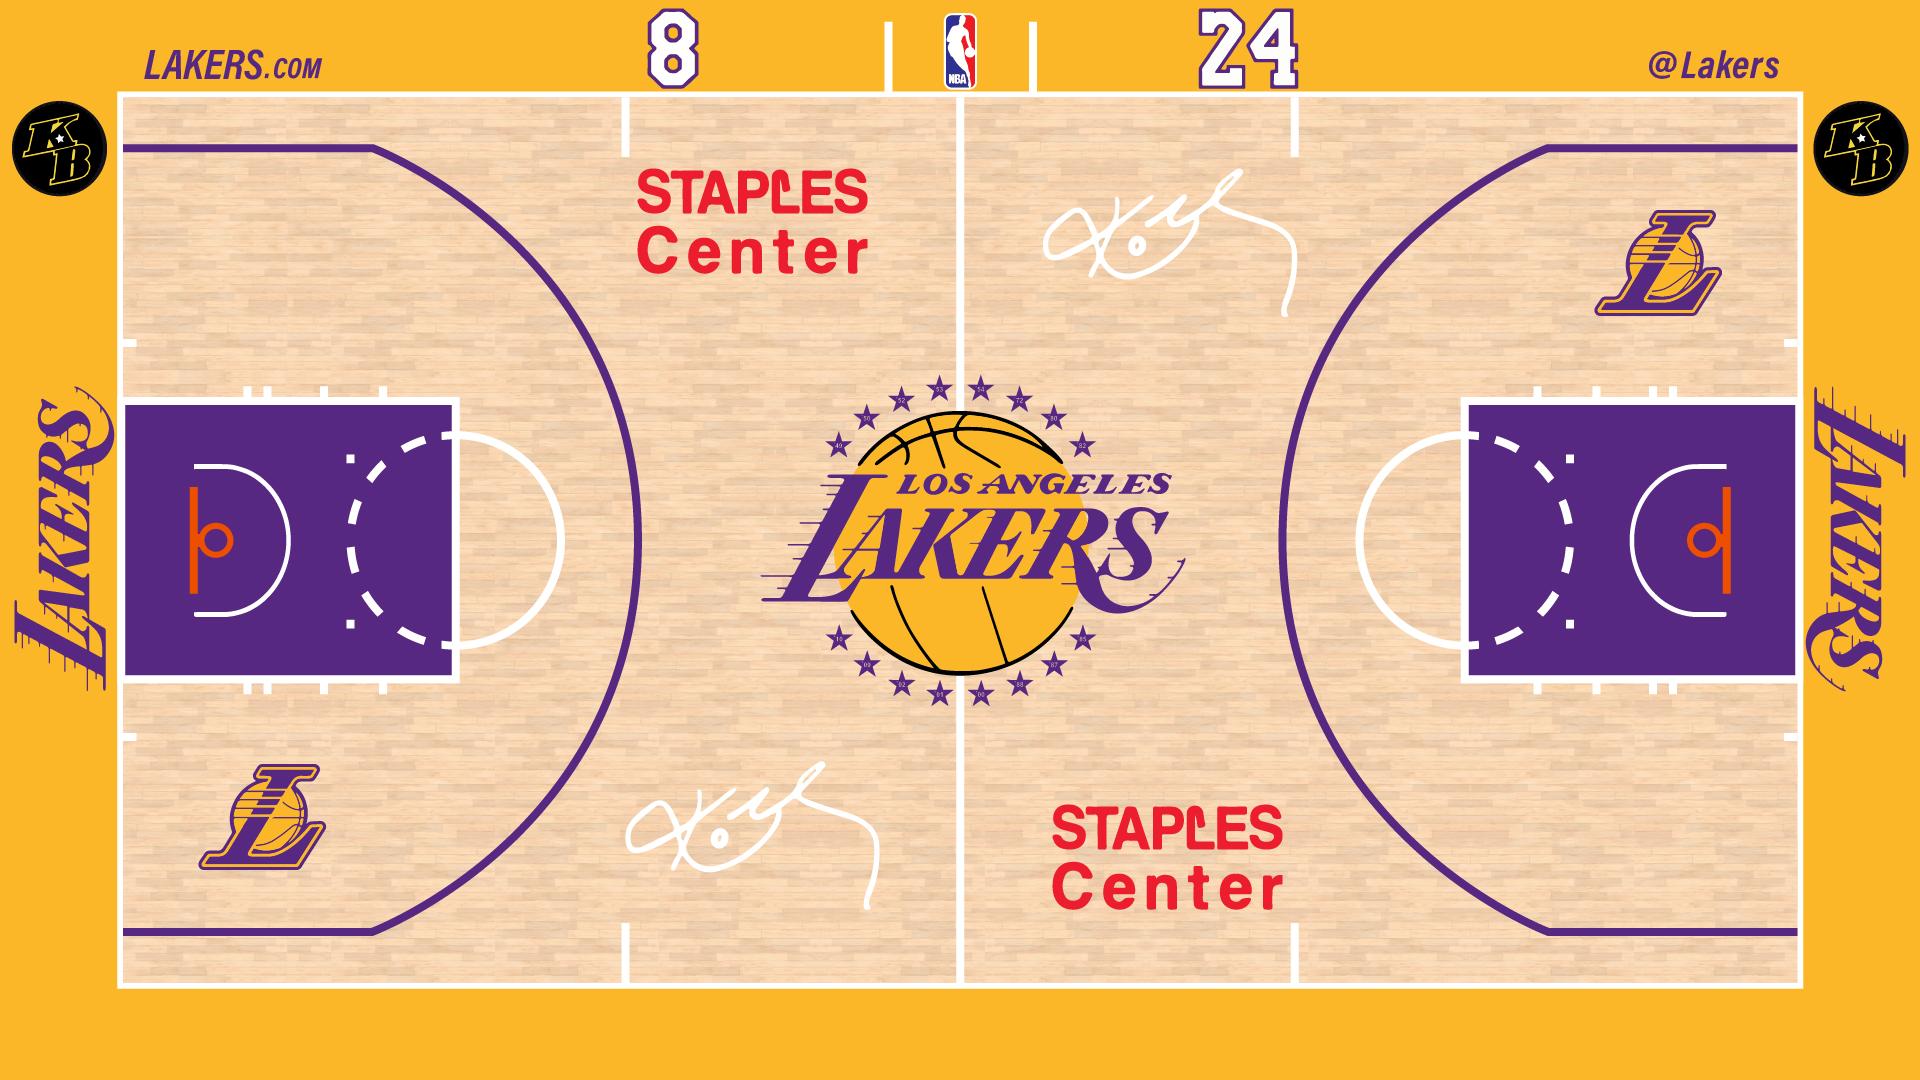 Wallpaper Kobe Bryant Nba Los Angeles Lakers 1920x1080 Jerrysun615 1785291 Hd Wallpapers Wallhere